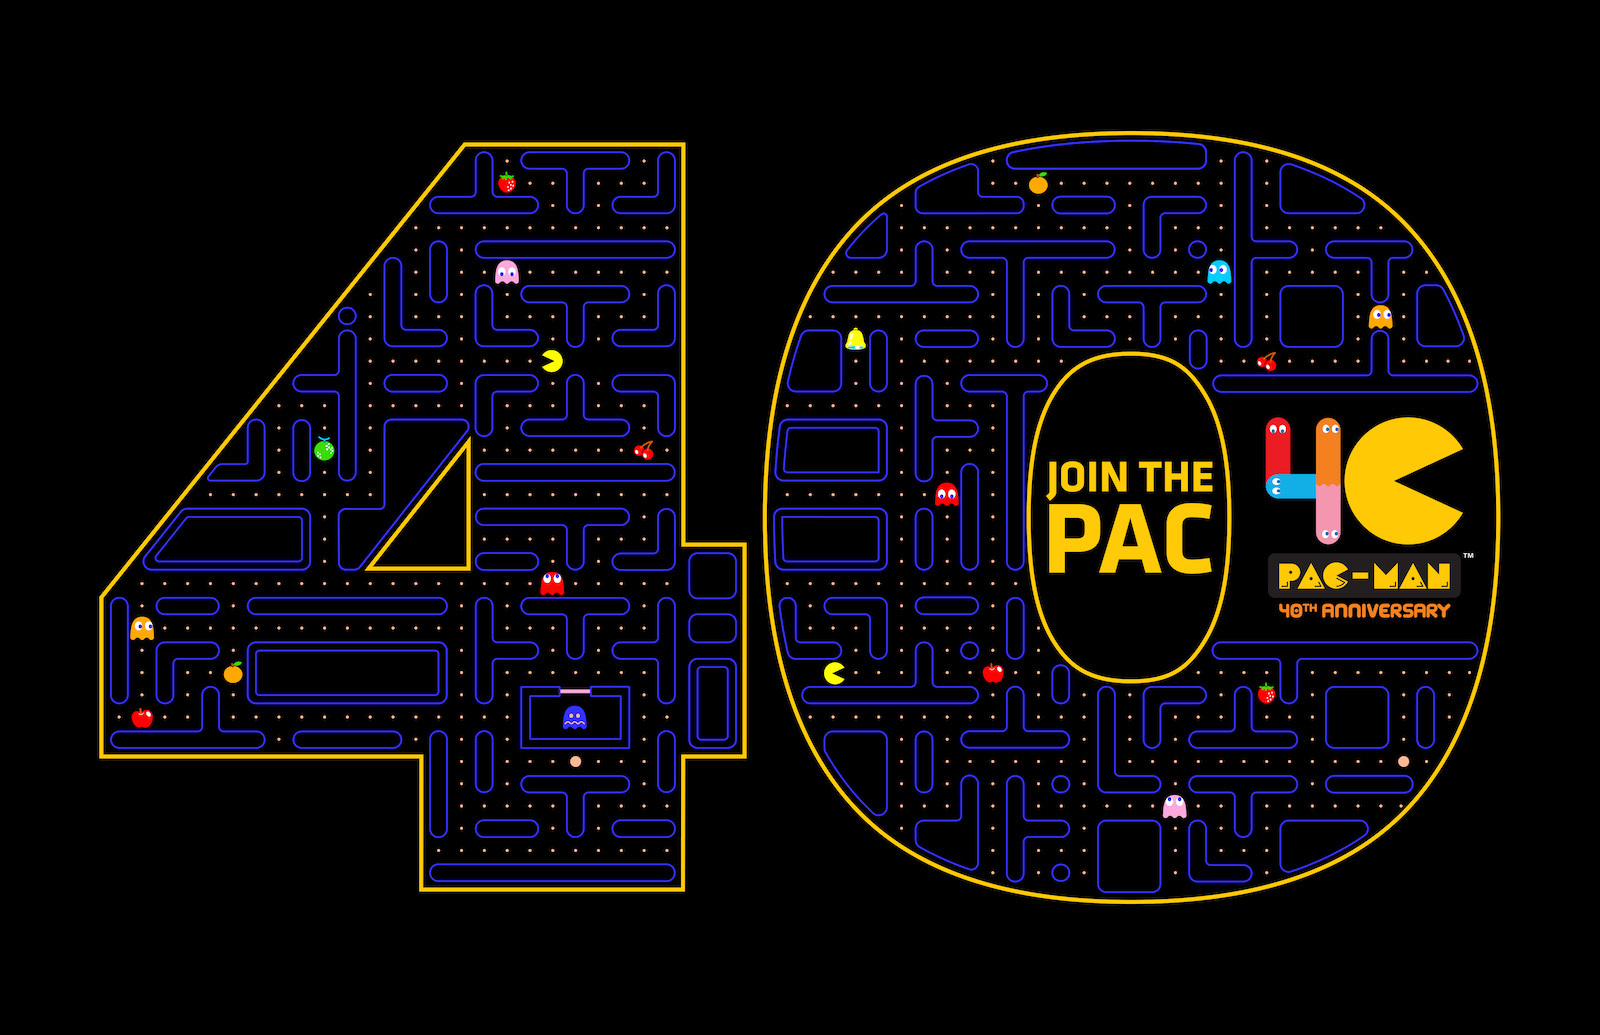 Birthday Party Review Of Pac Man Entertainment Schaumburg Il Tripadvisor